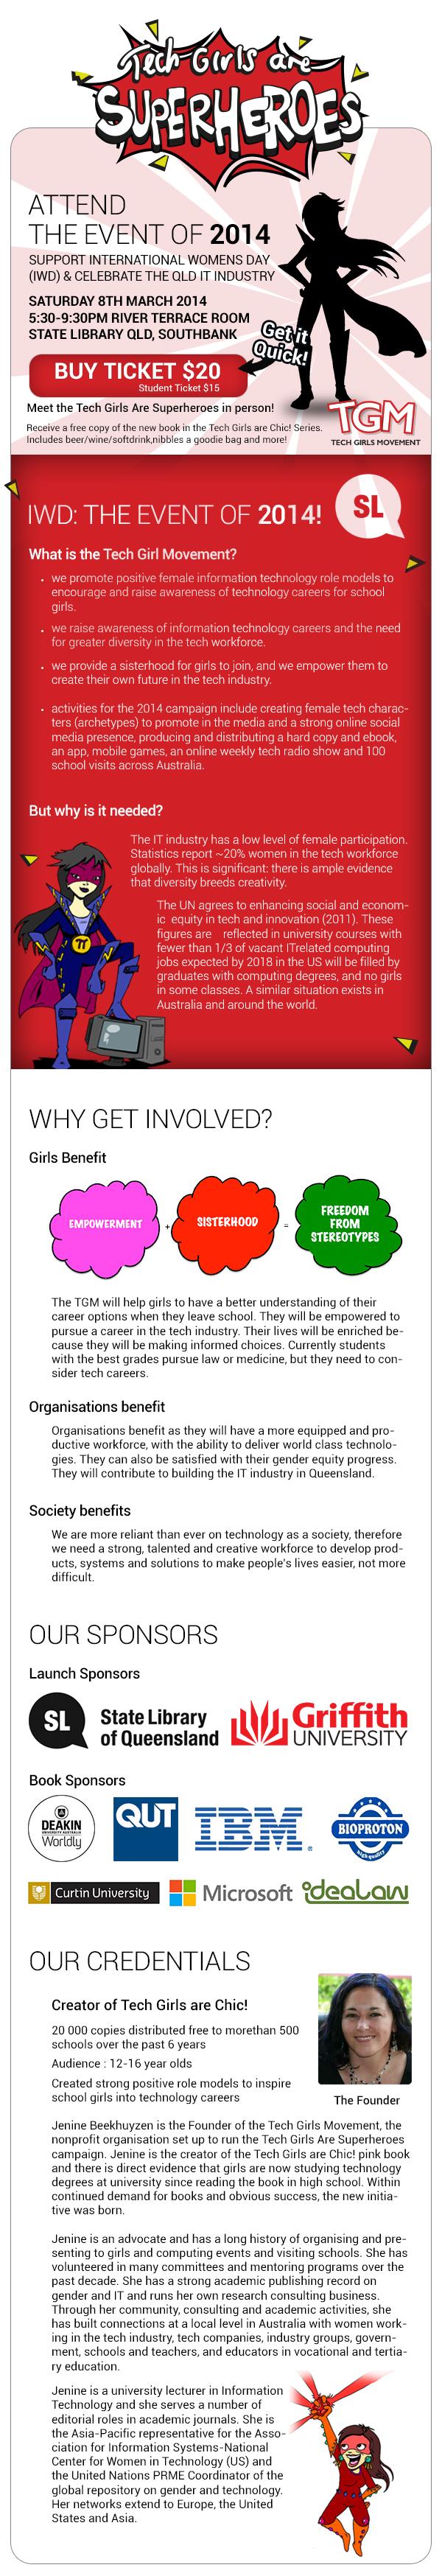 Email Marketing Tech Girls are Superheroes_2-4.jpg